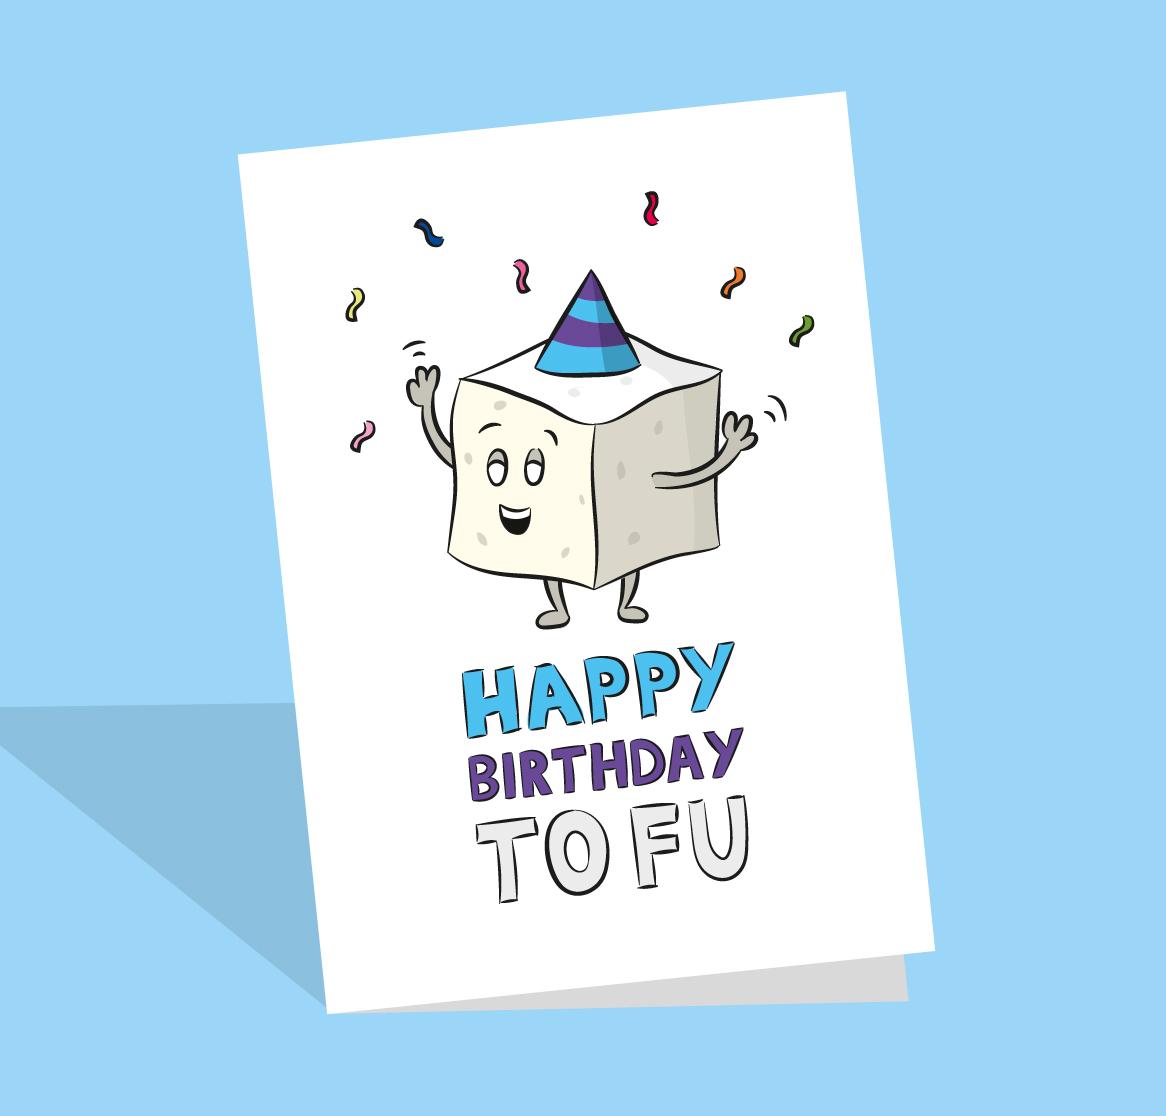 Tofu card